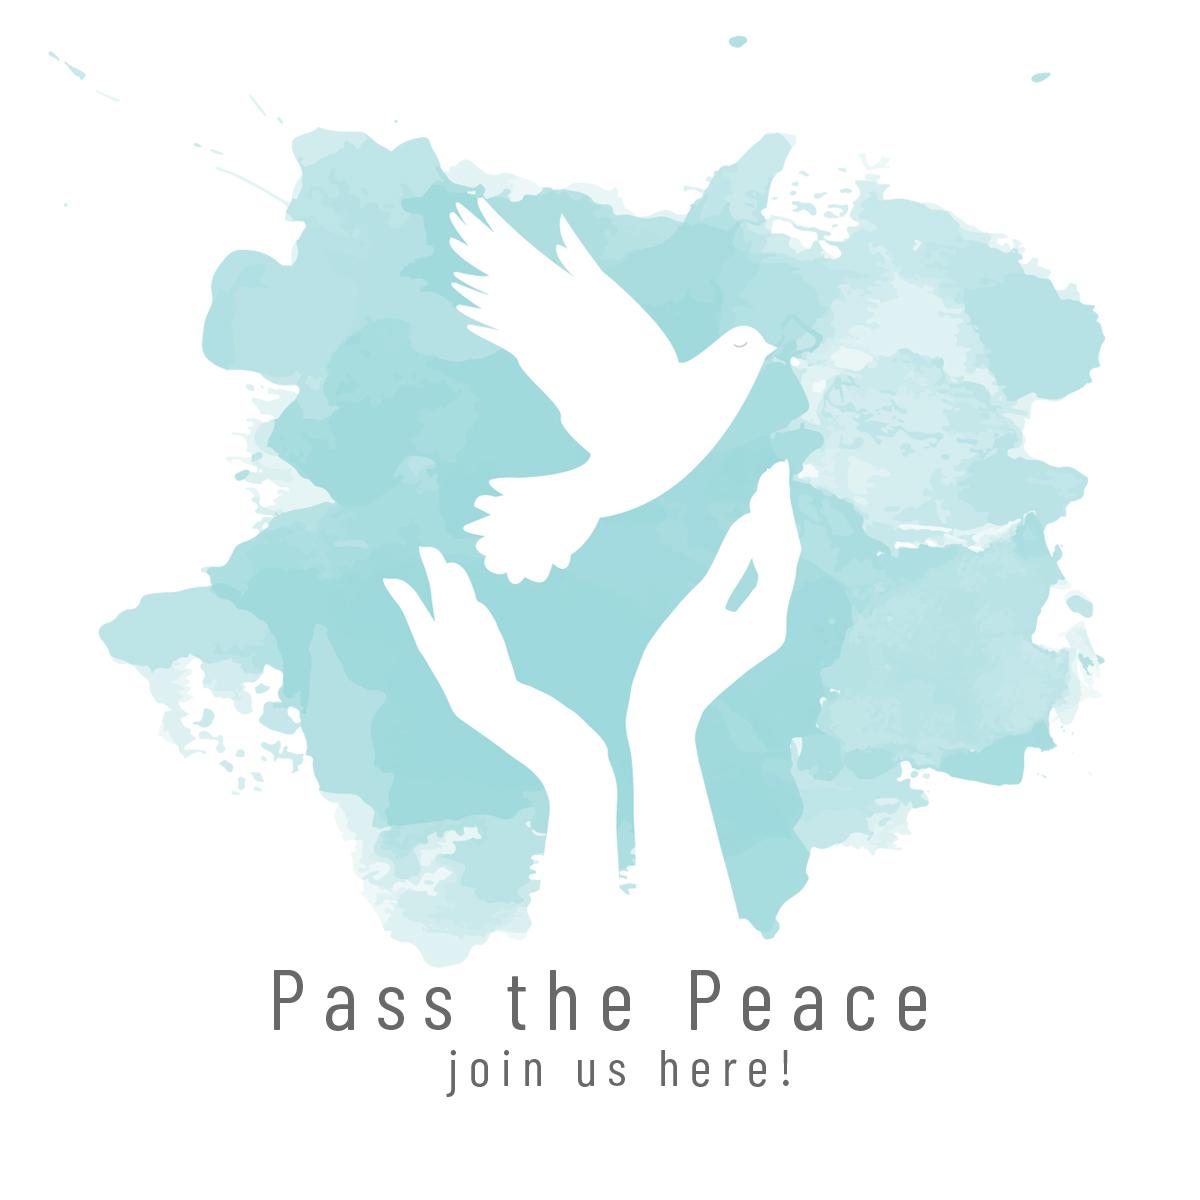 passthepeace_793